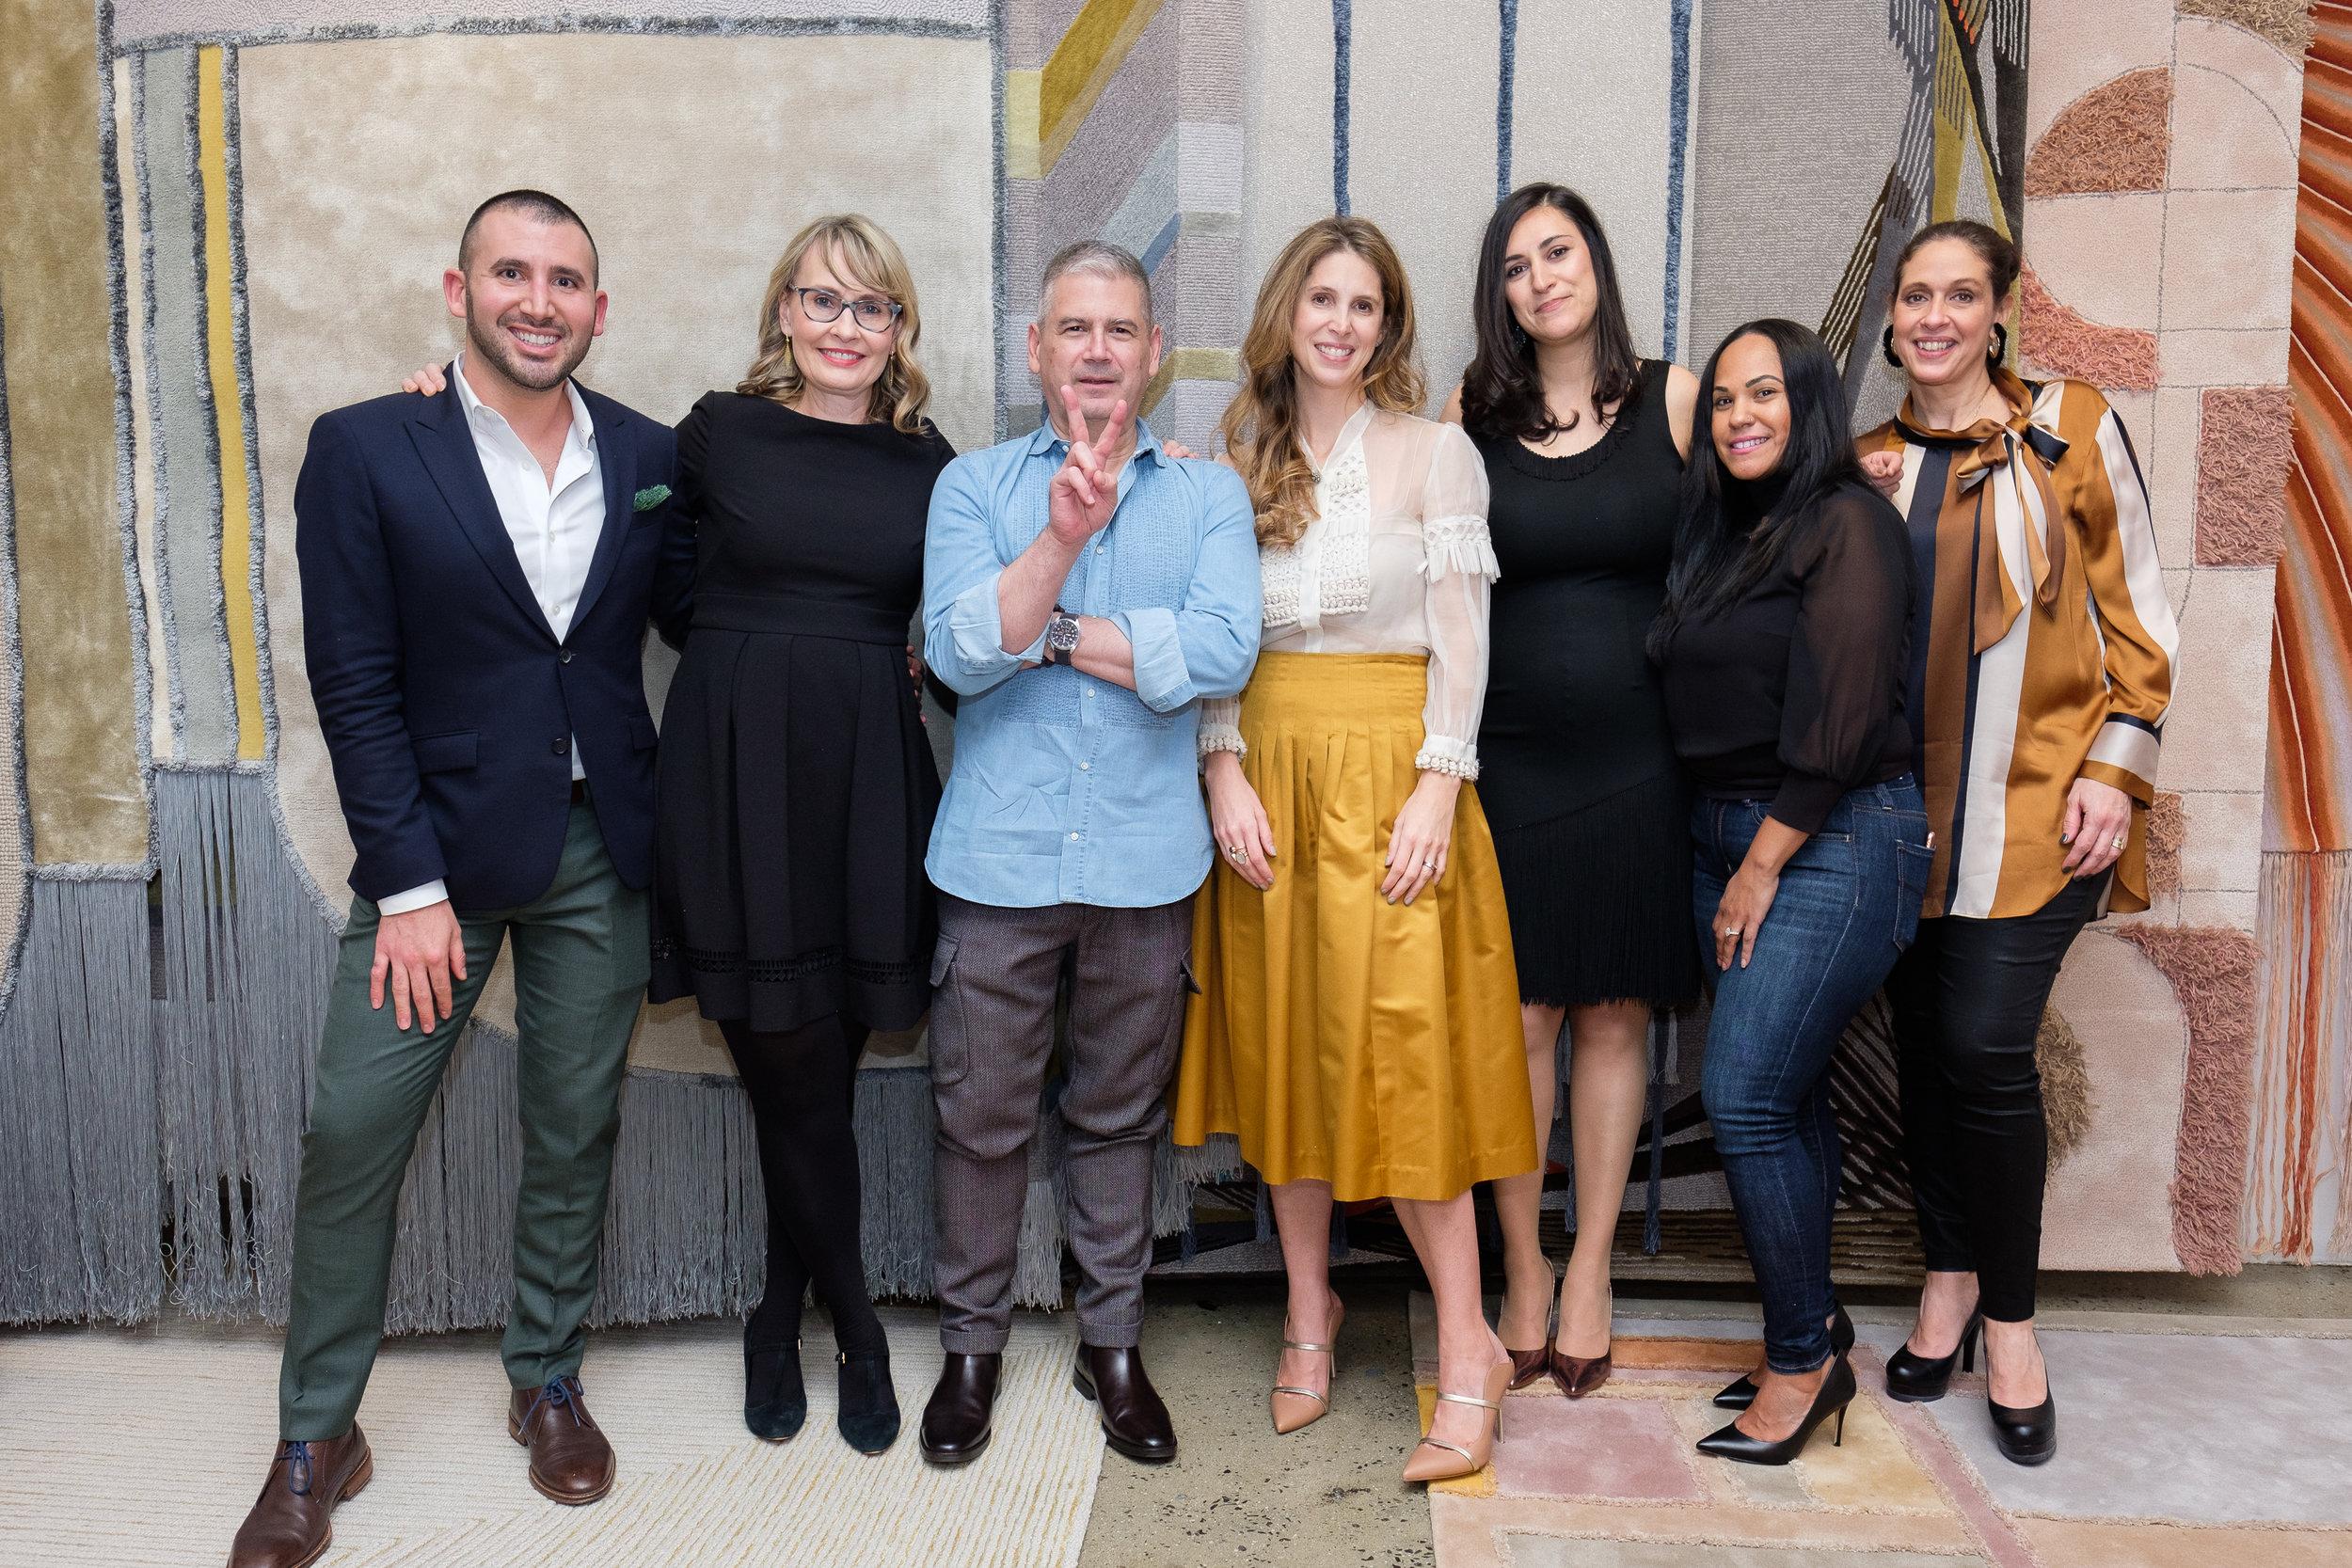 Alan Gilmer, Karen Majestic, Fabio Mejia, Juliana Polastri, Ariana Massouh, Mimi Pimentel, Bethany Hopf (all Edward Fields)